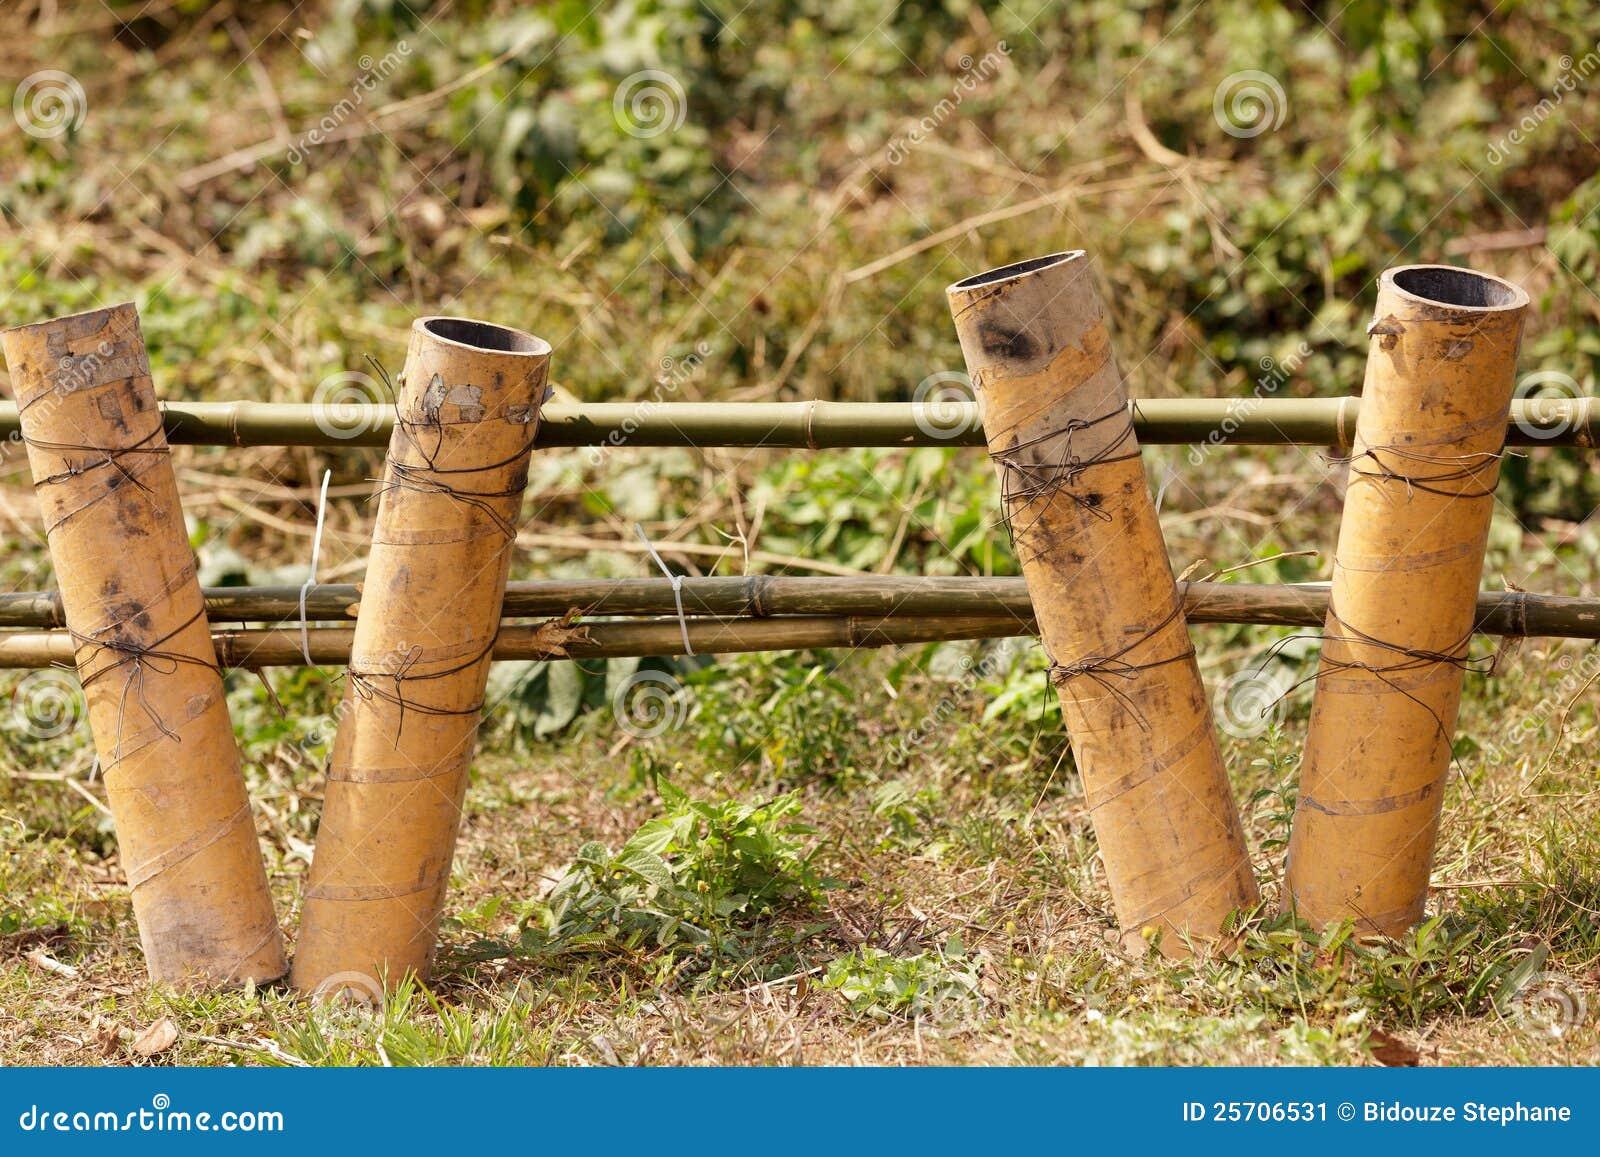 Mortar In Field : Fireworks mortars stock image